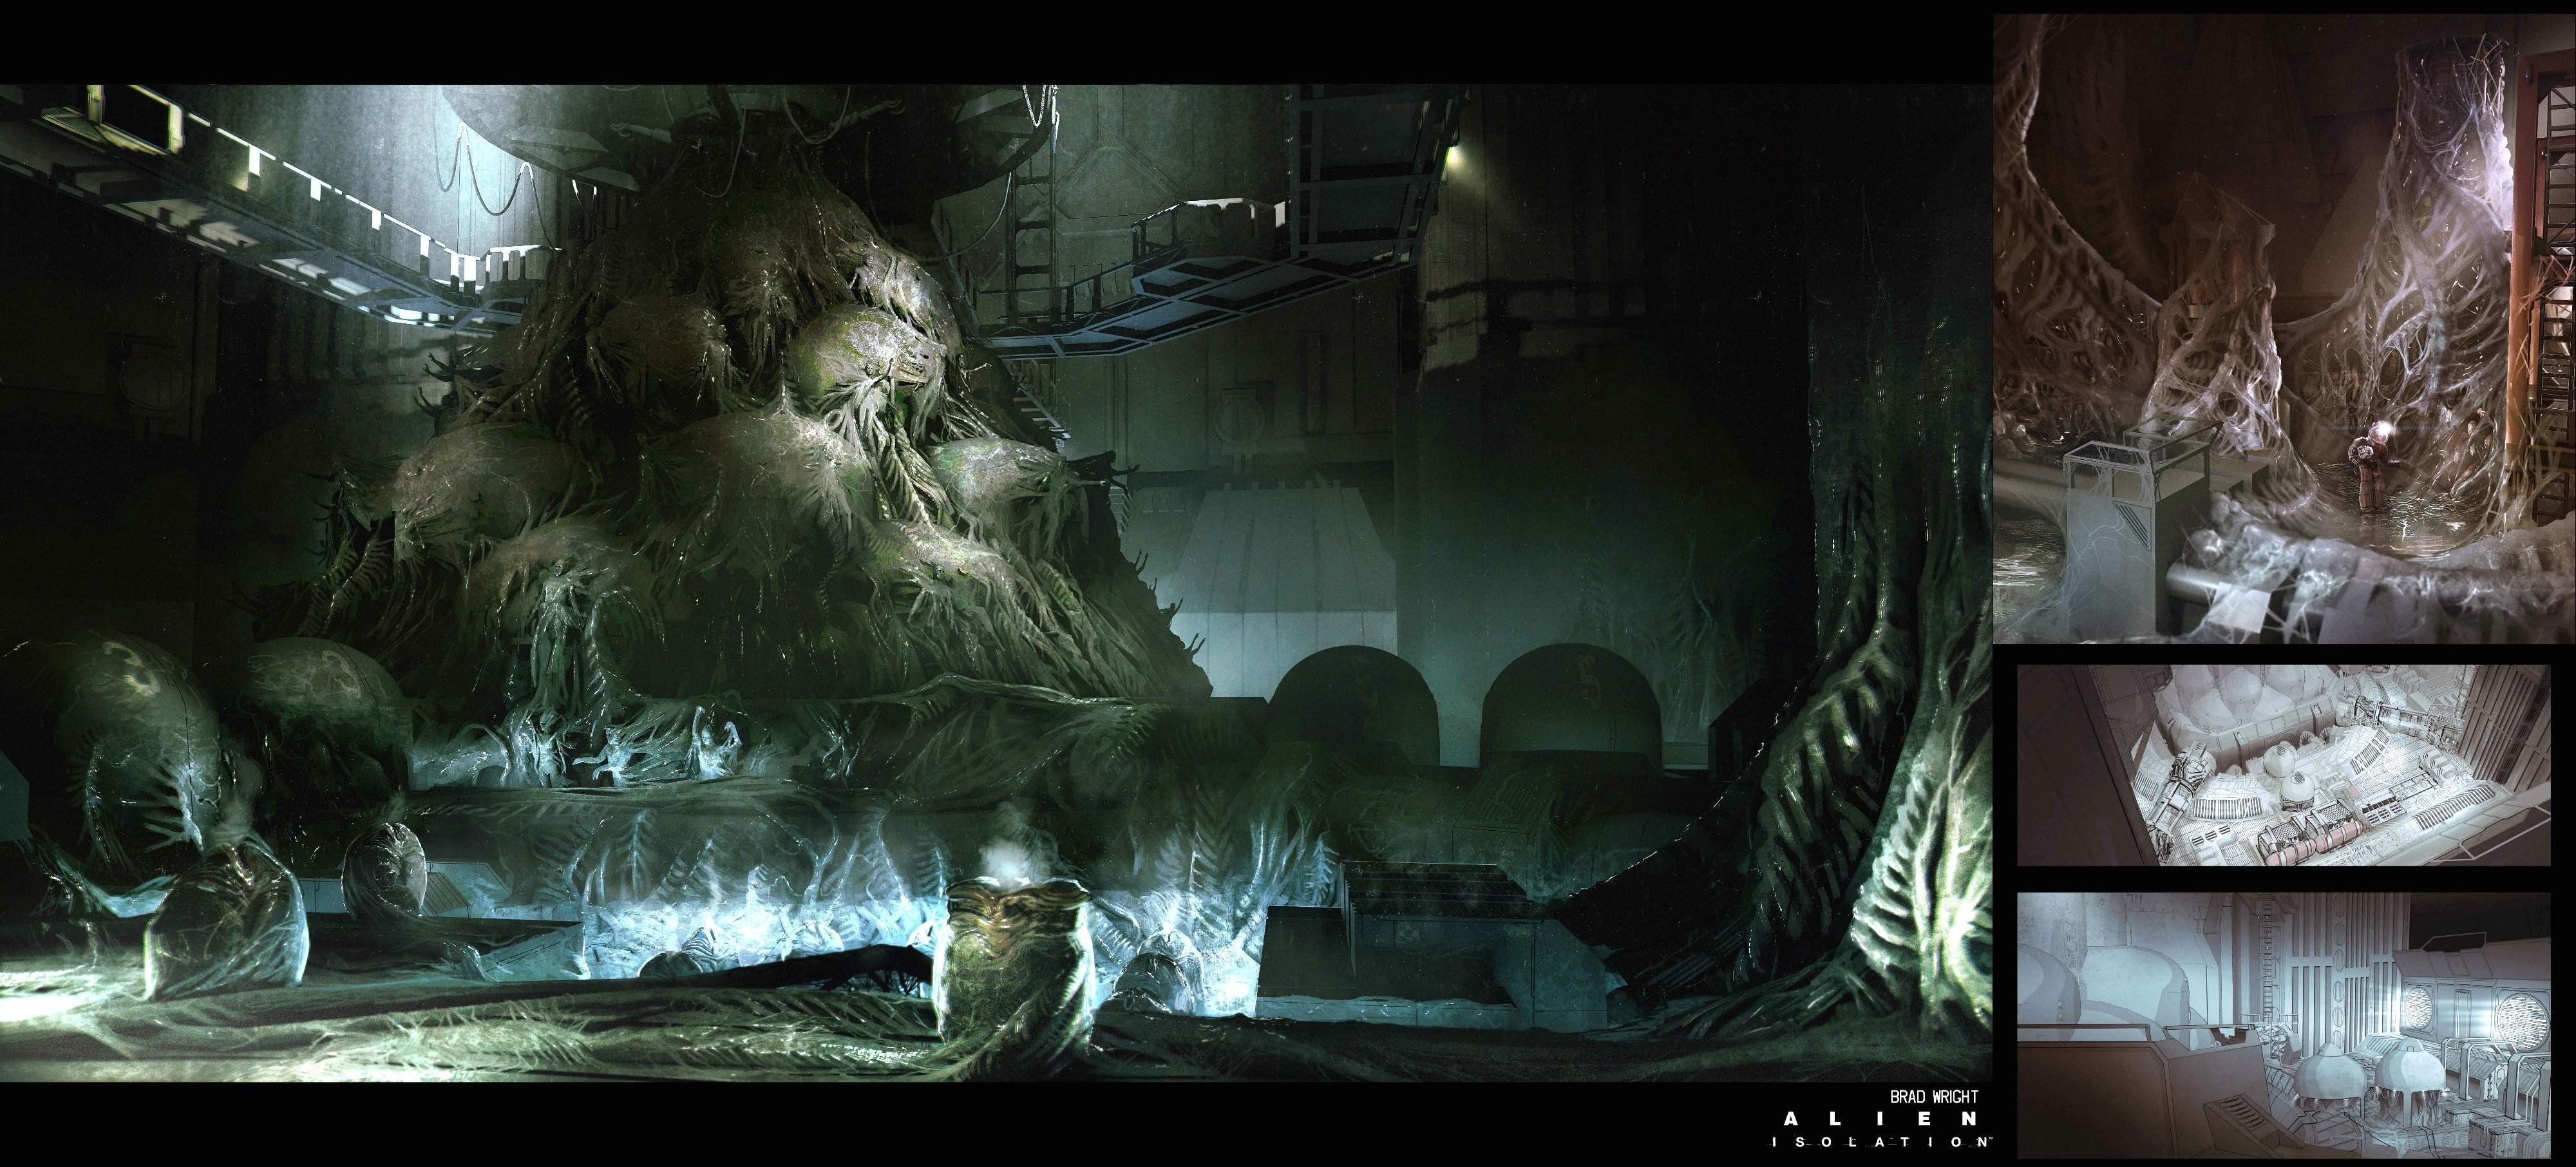 Dark, Hd Wallpapers, Abstract Hd Wallpaper, Survival, - Sci Fi Horror Background - HD Wallpaper